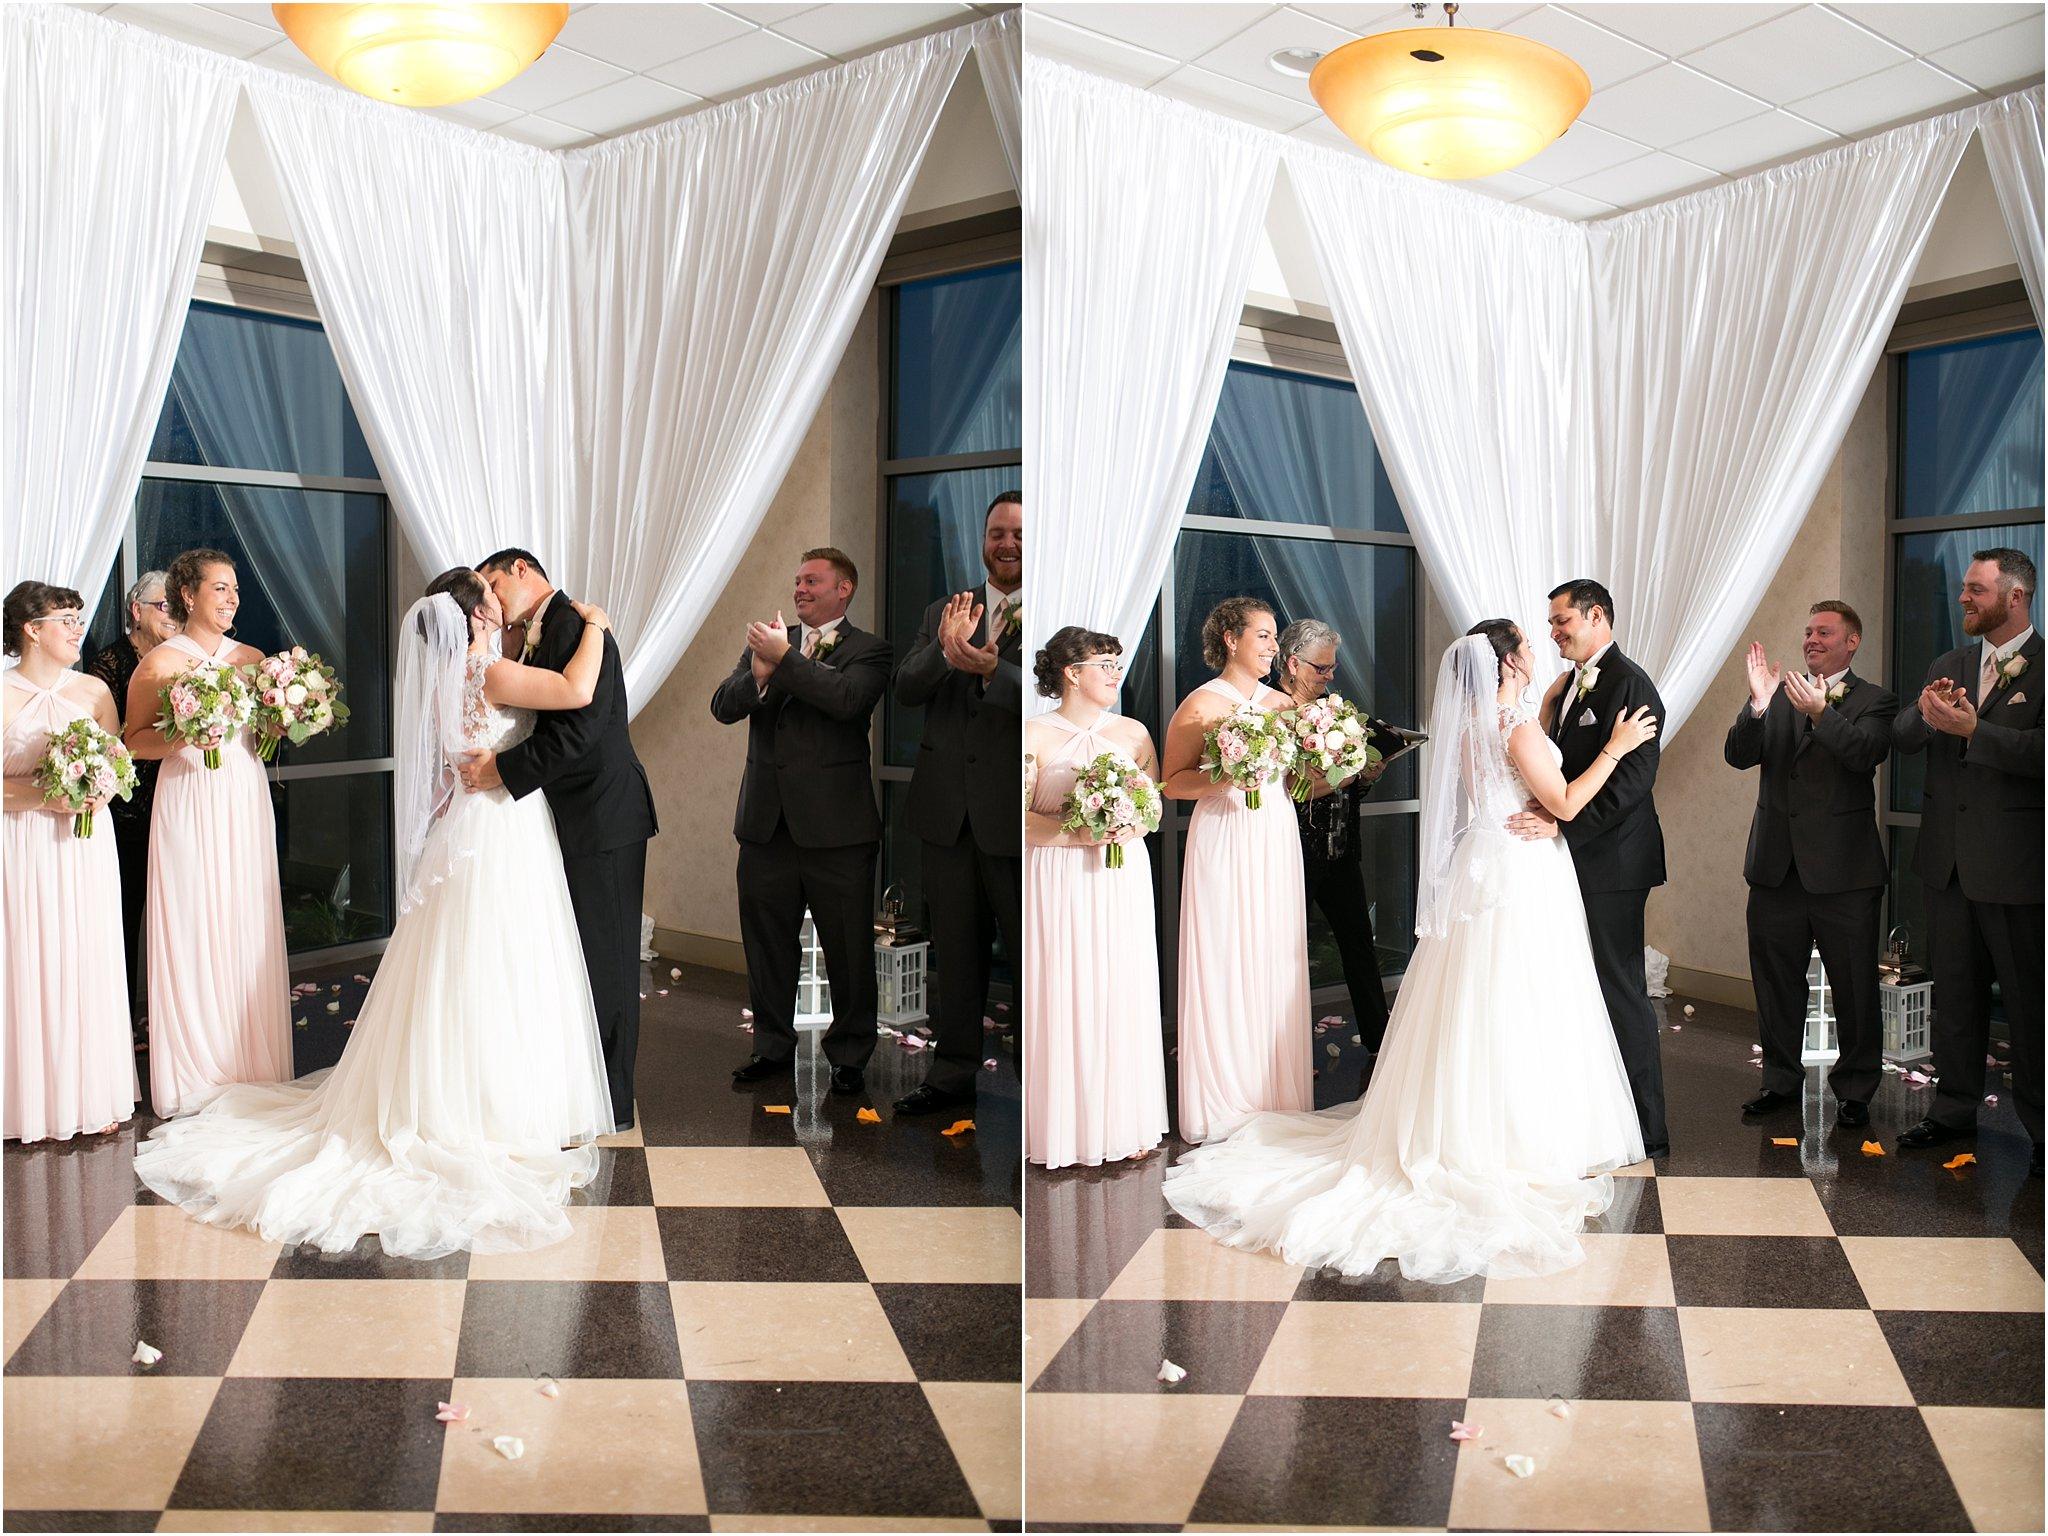 jessica_ryan_photography_virginia_wedding_photographer_wedding_hurricane_norfolk_botanical_gardens_hurricane_matthew_wedding_3597